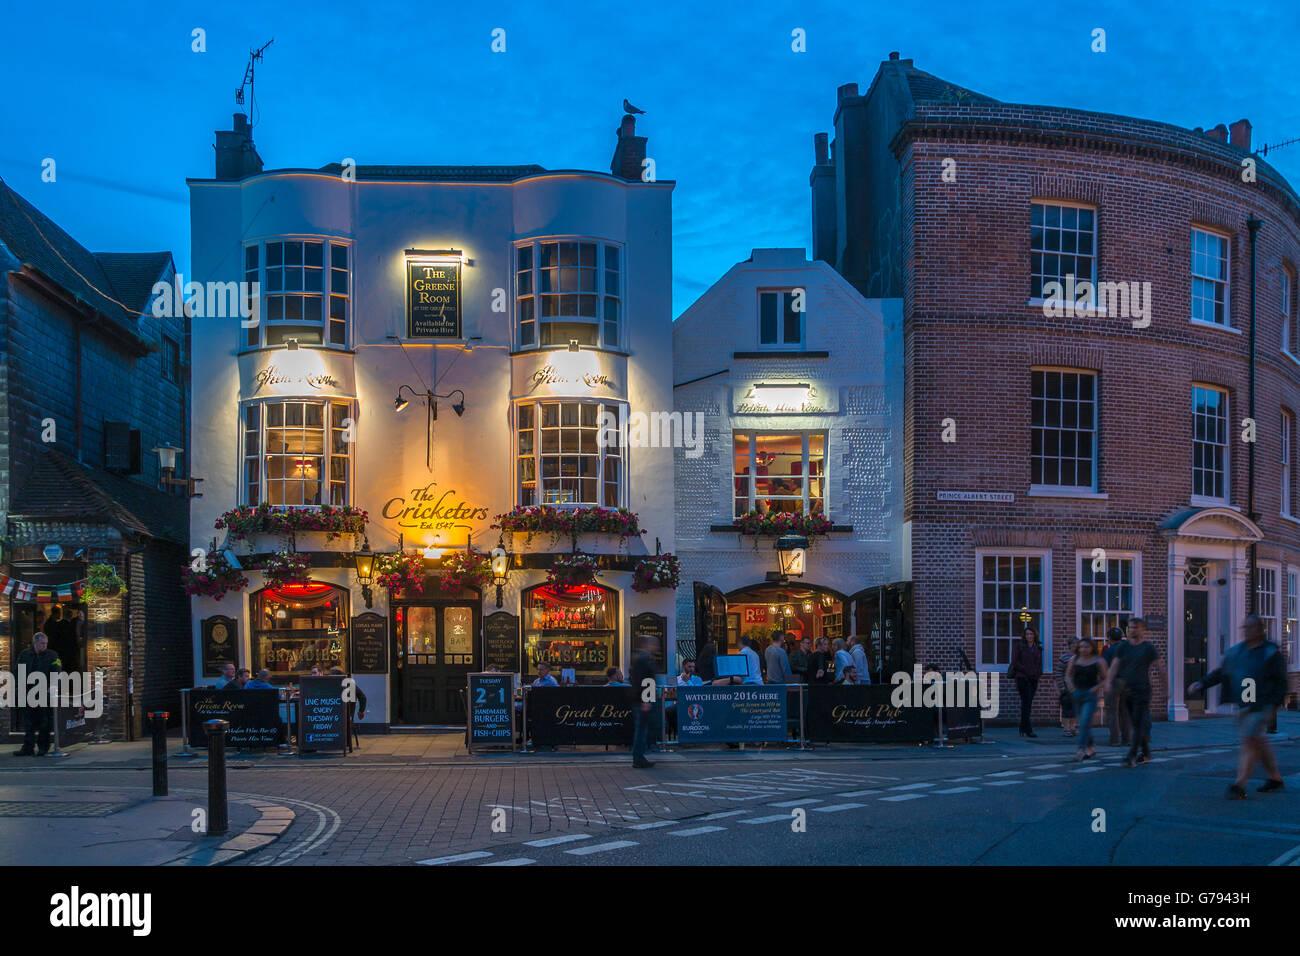 The Cricketers Prince Albert Street Brighton Night Life - Stock Image